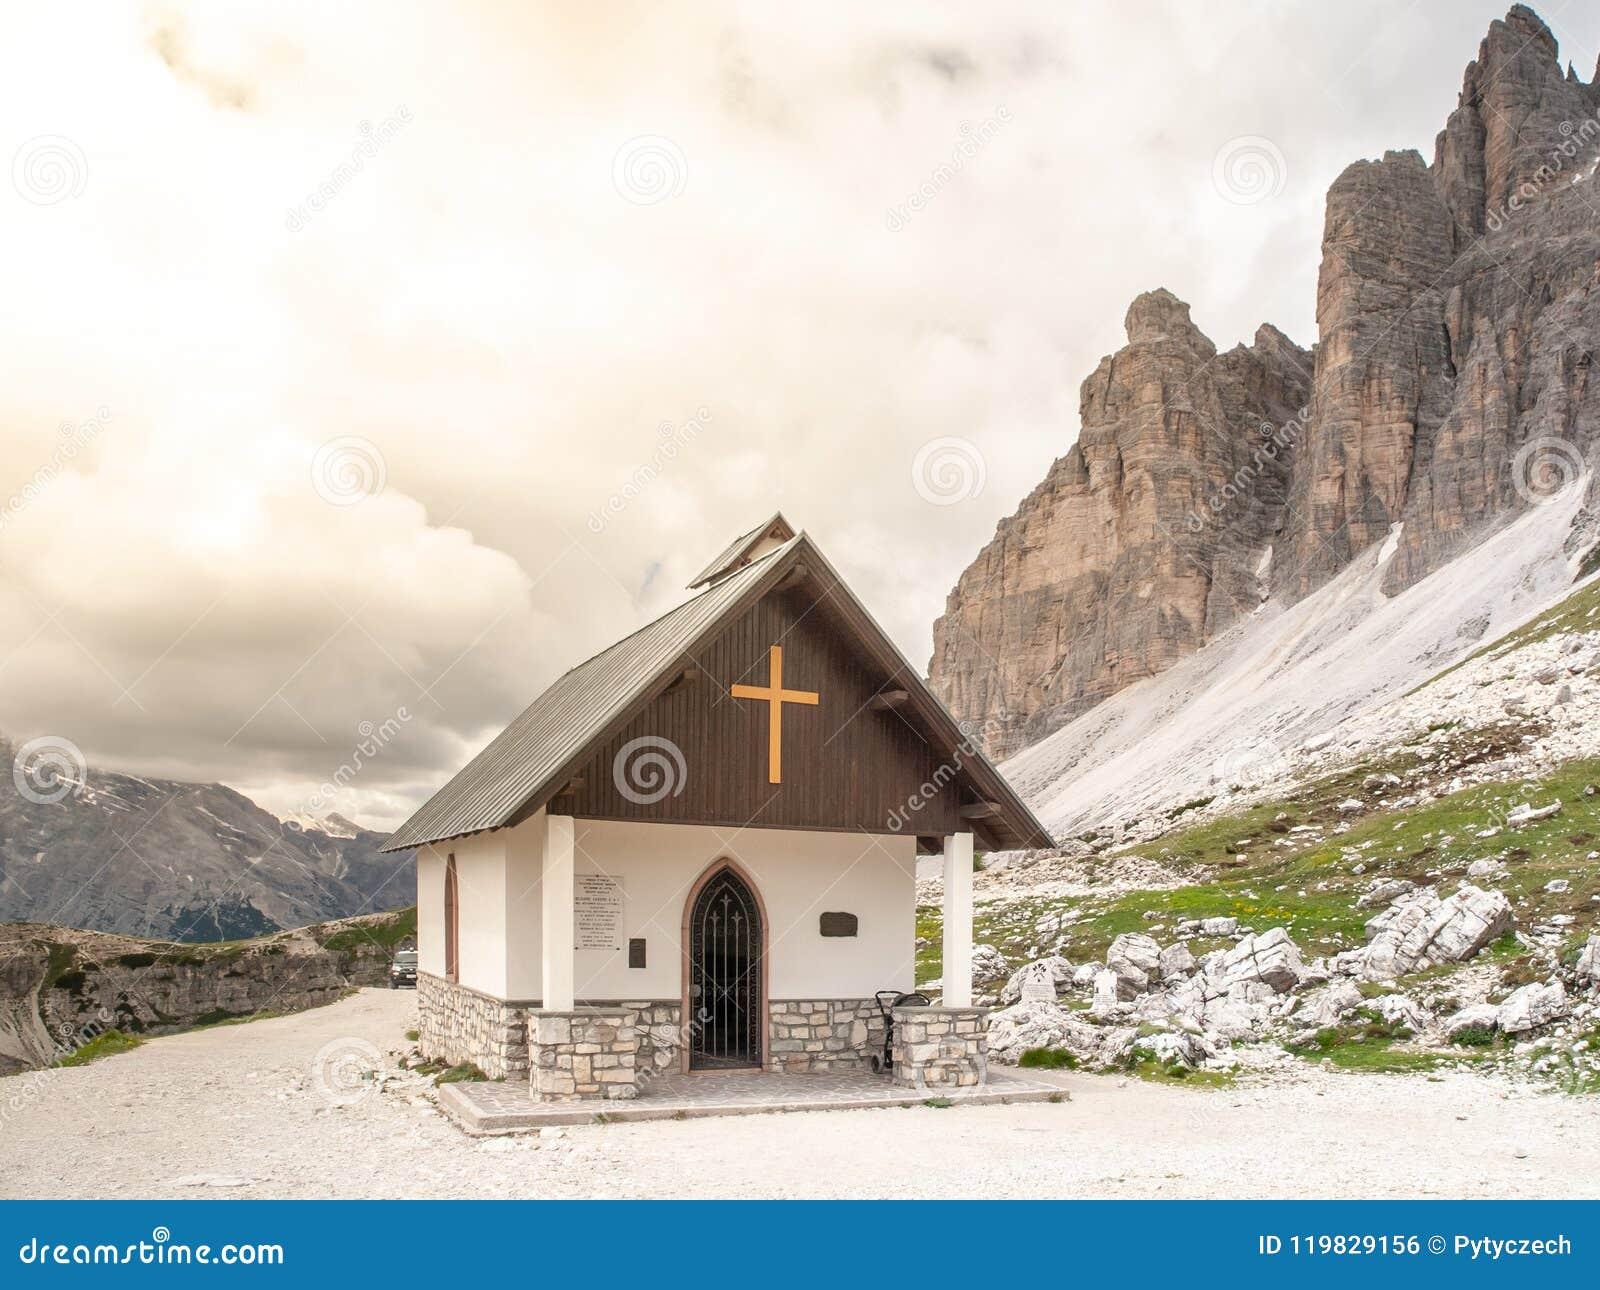 Pequeña capilla de la montaña, degli Alpini de Cappella, en Tre Cime di Lavaredo, dolomías, Italia